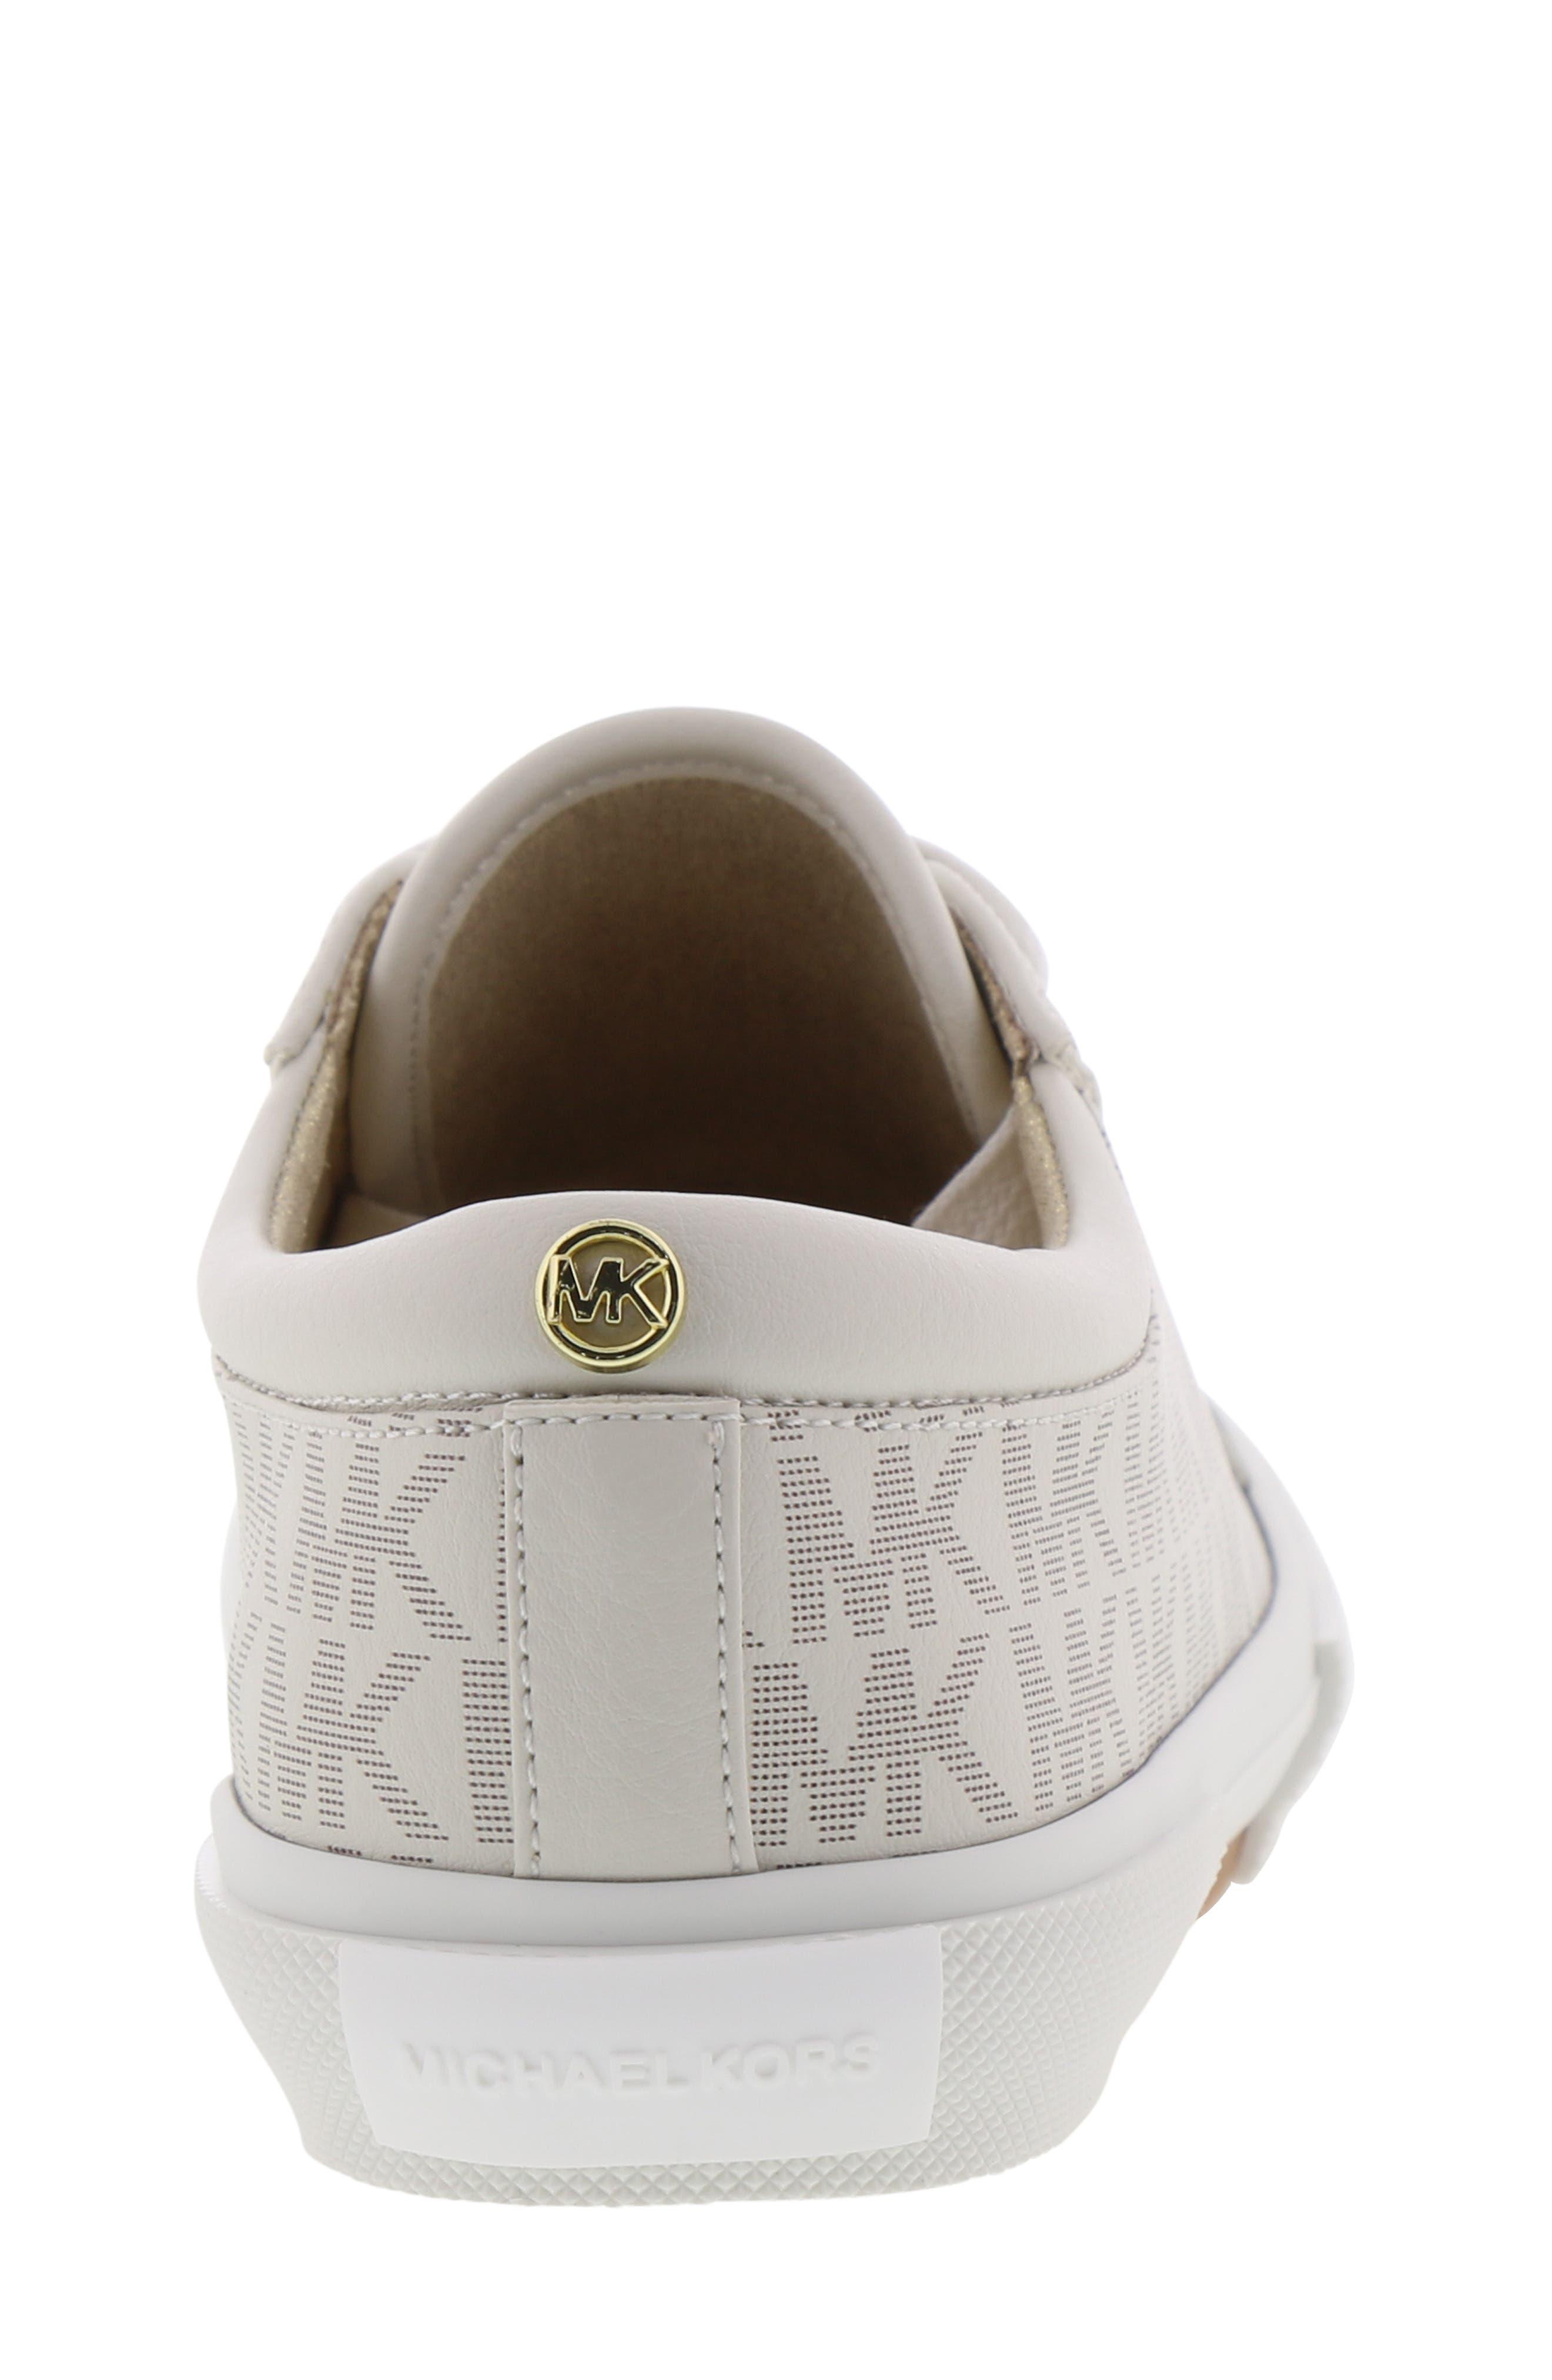 MICHAEL MICHAEL KORS, Ima Rebel Sneaker, Alternate thumbnail 7, color, VANILLA